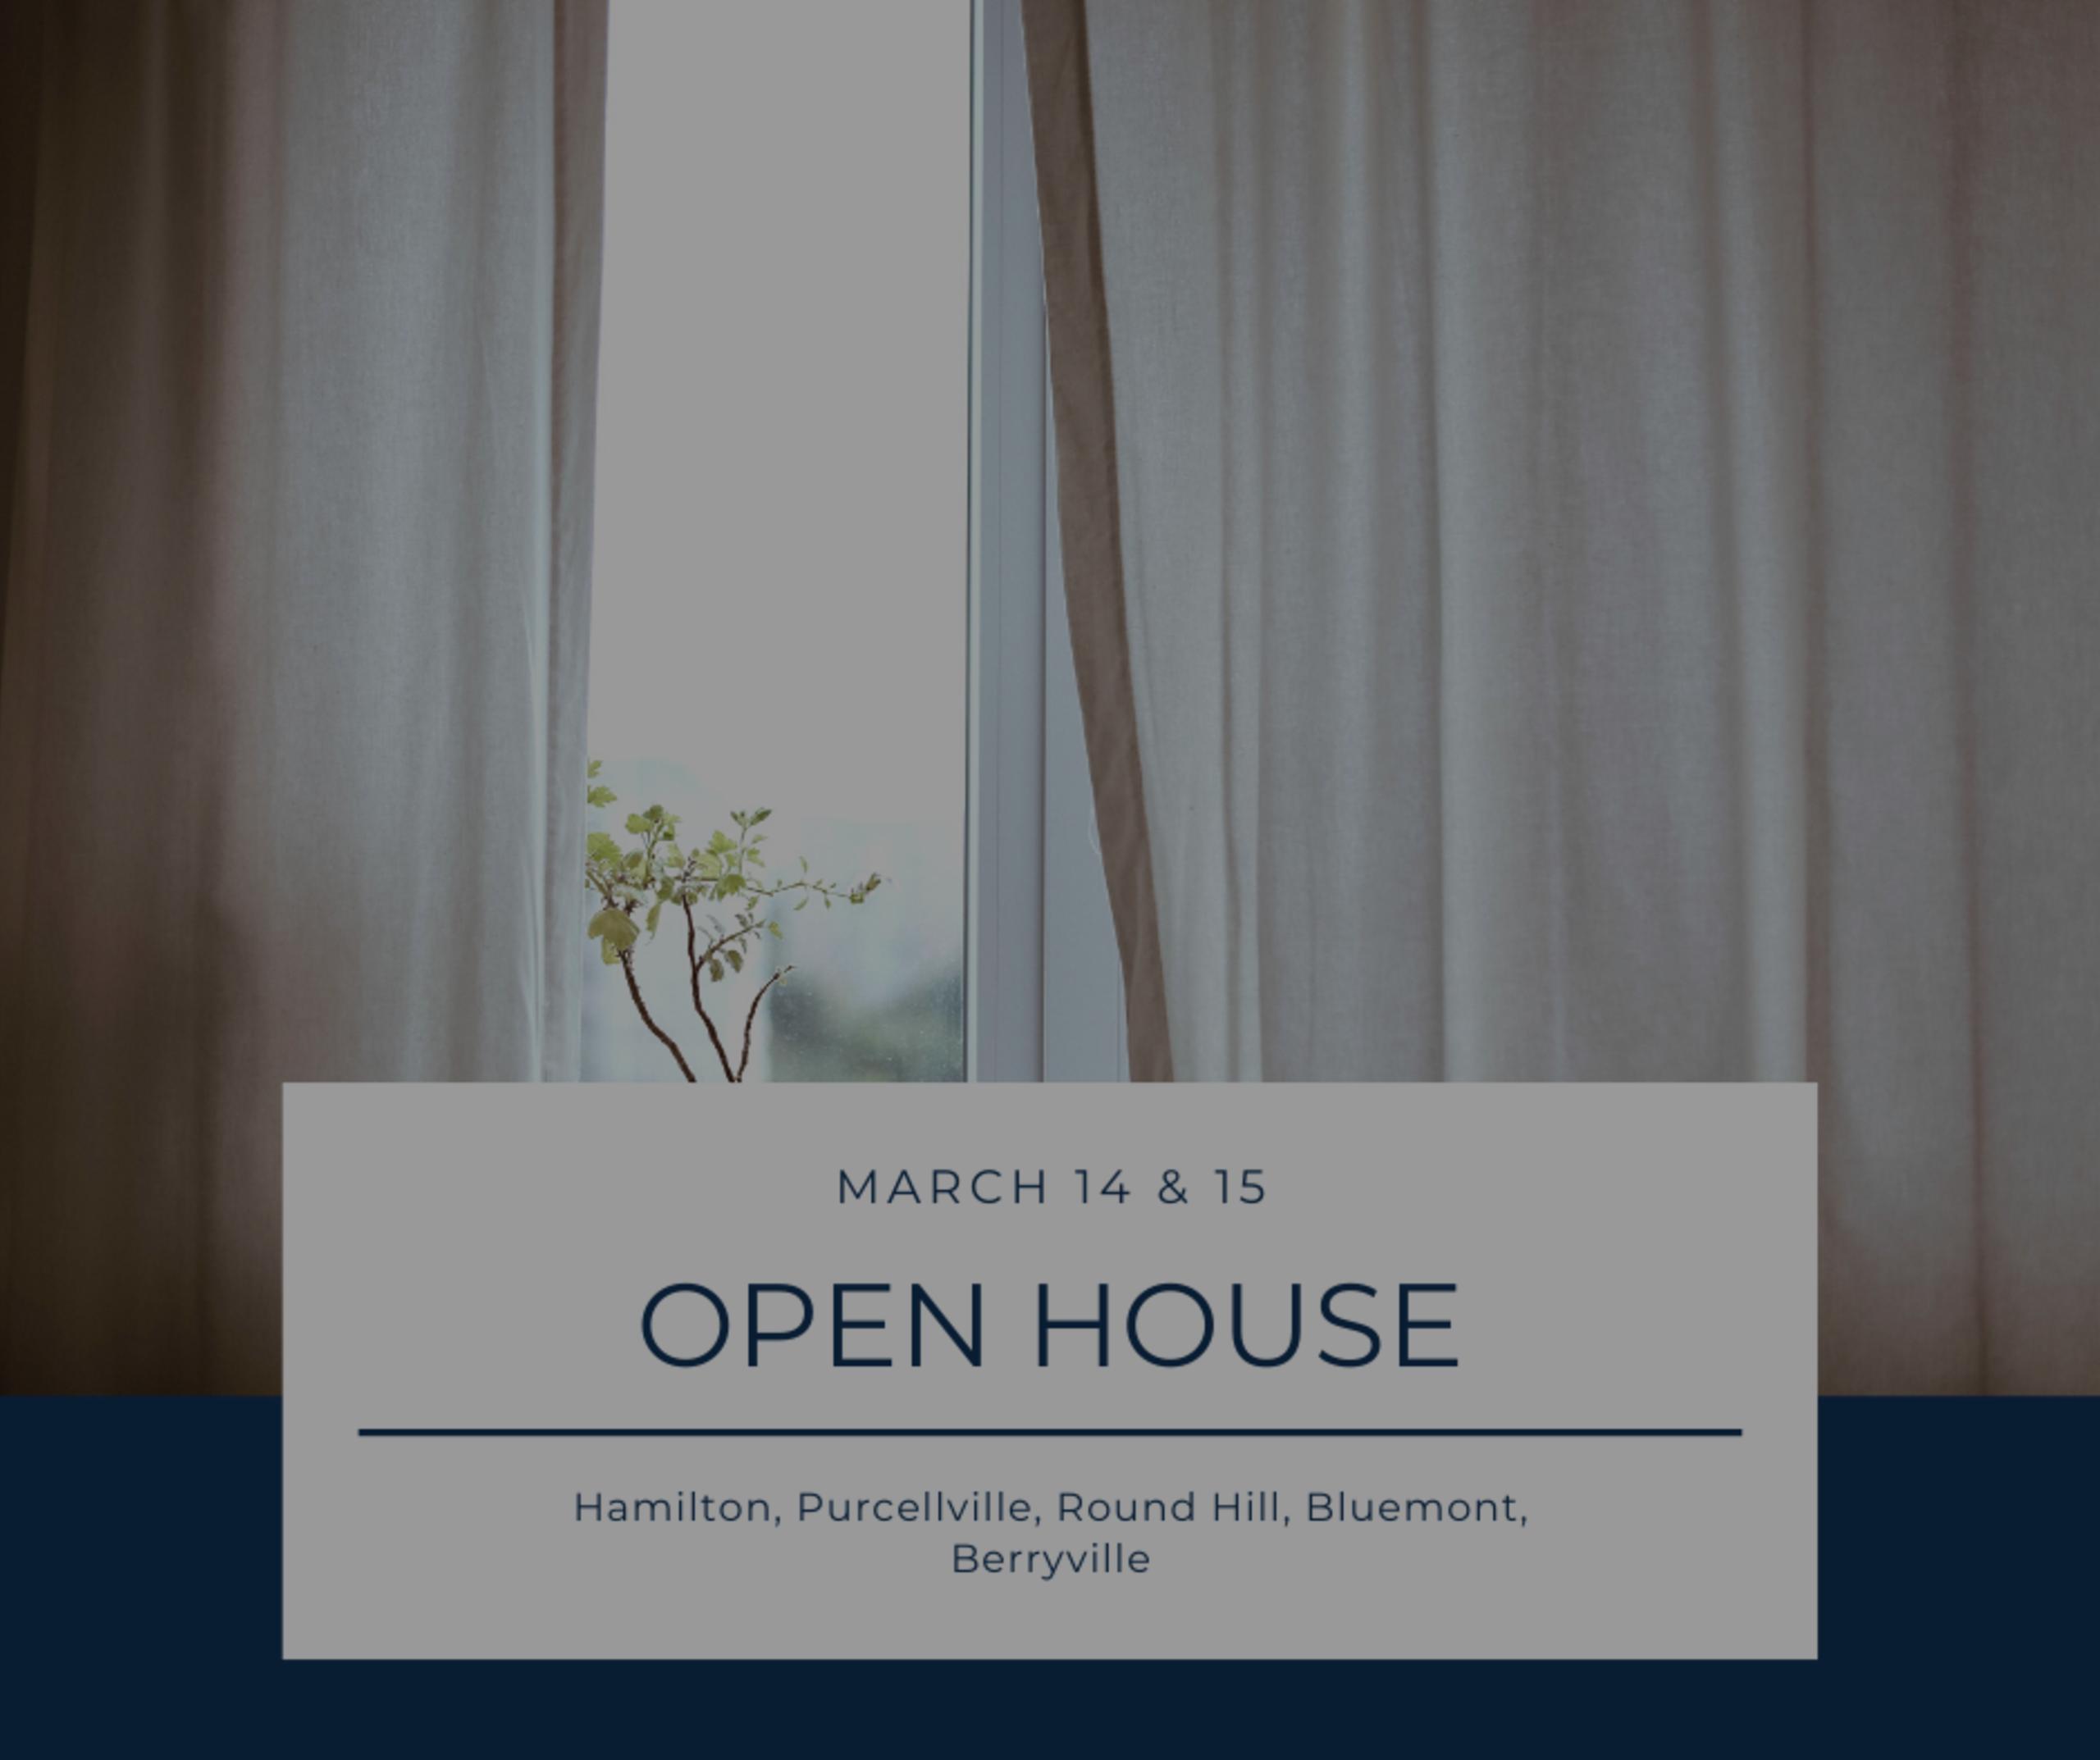 Open House List 3/14/20 – 3/15/20